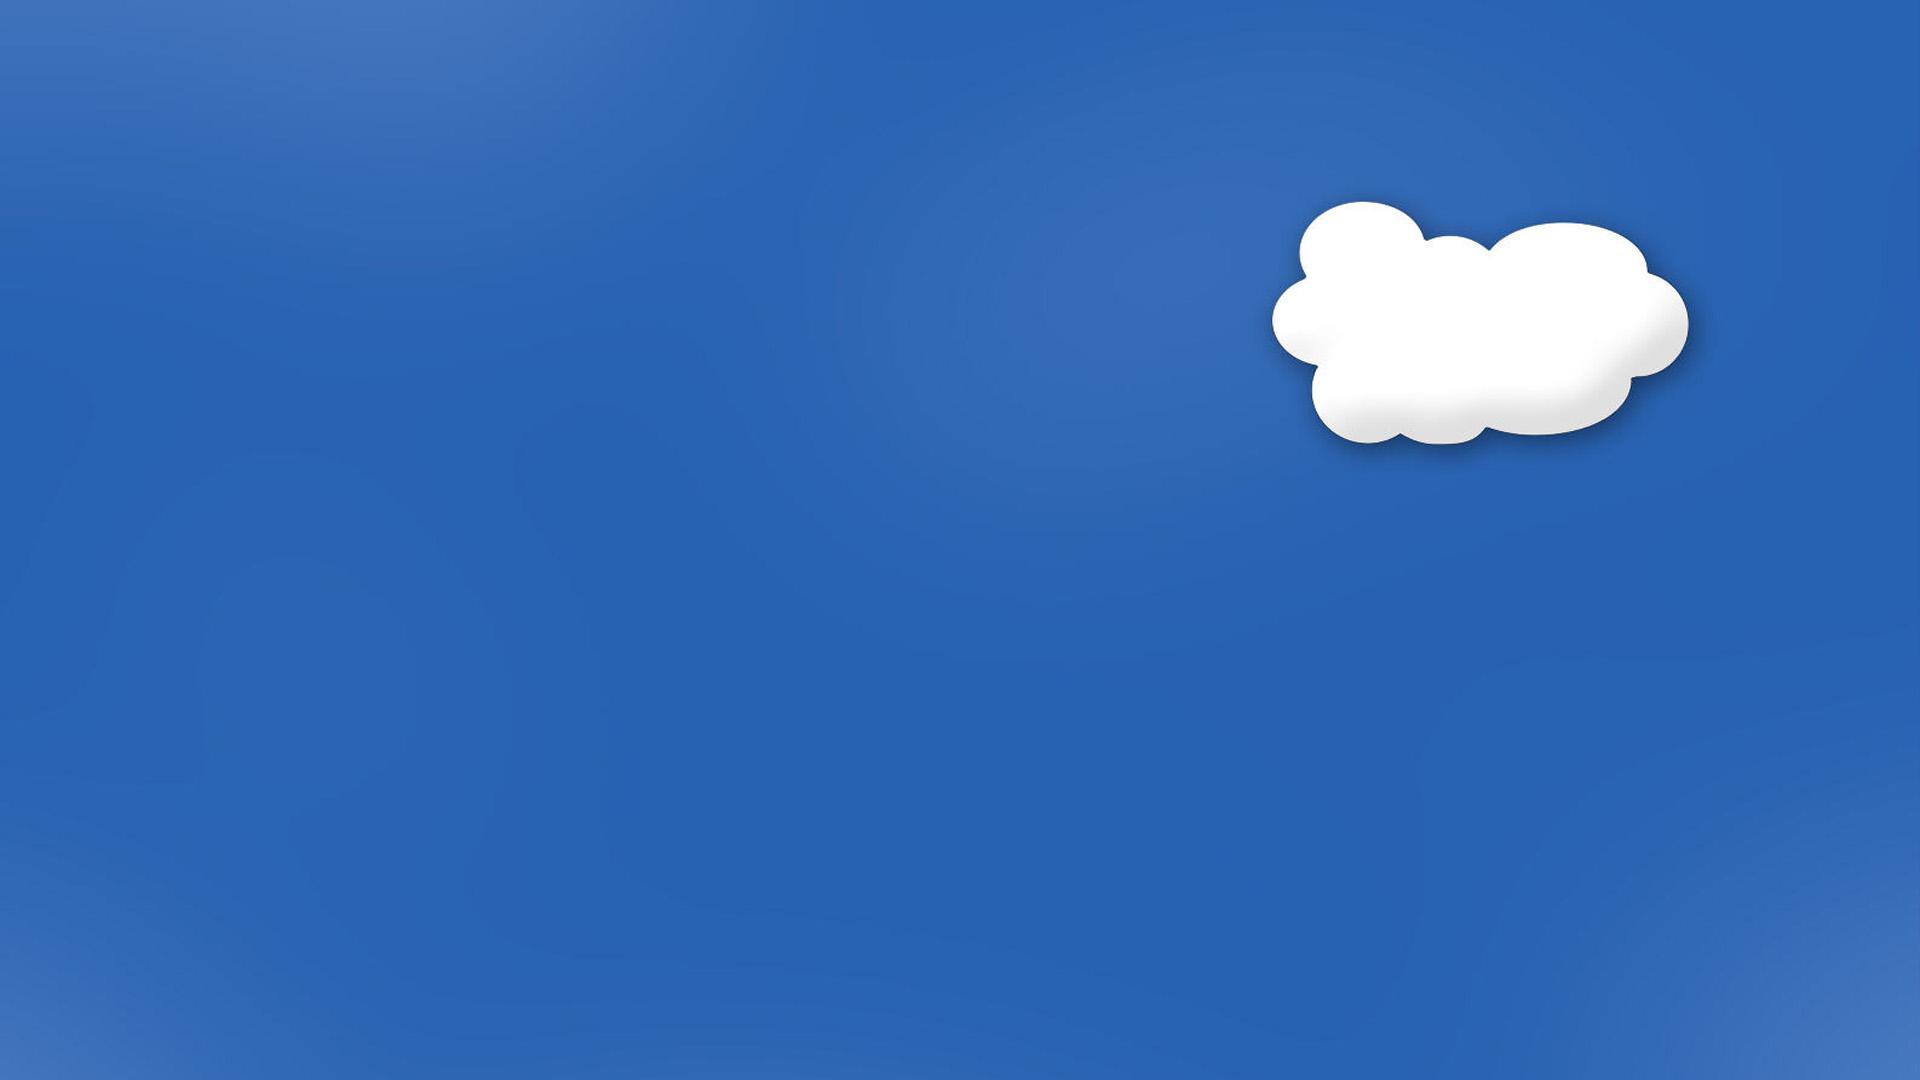 cloud wallpaper cartoon   HD Desktop Wallpapers 1920x1080